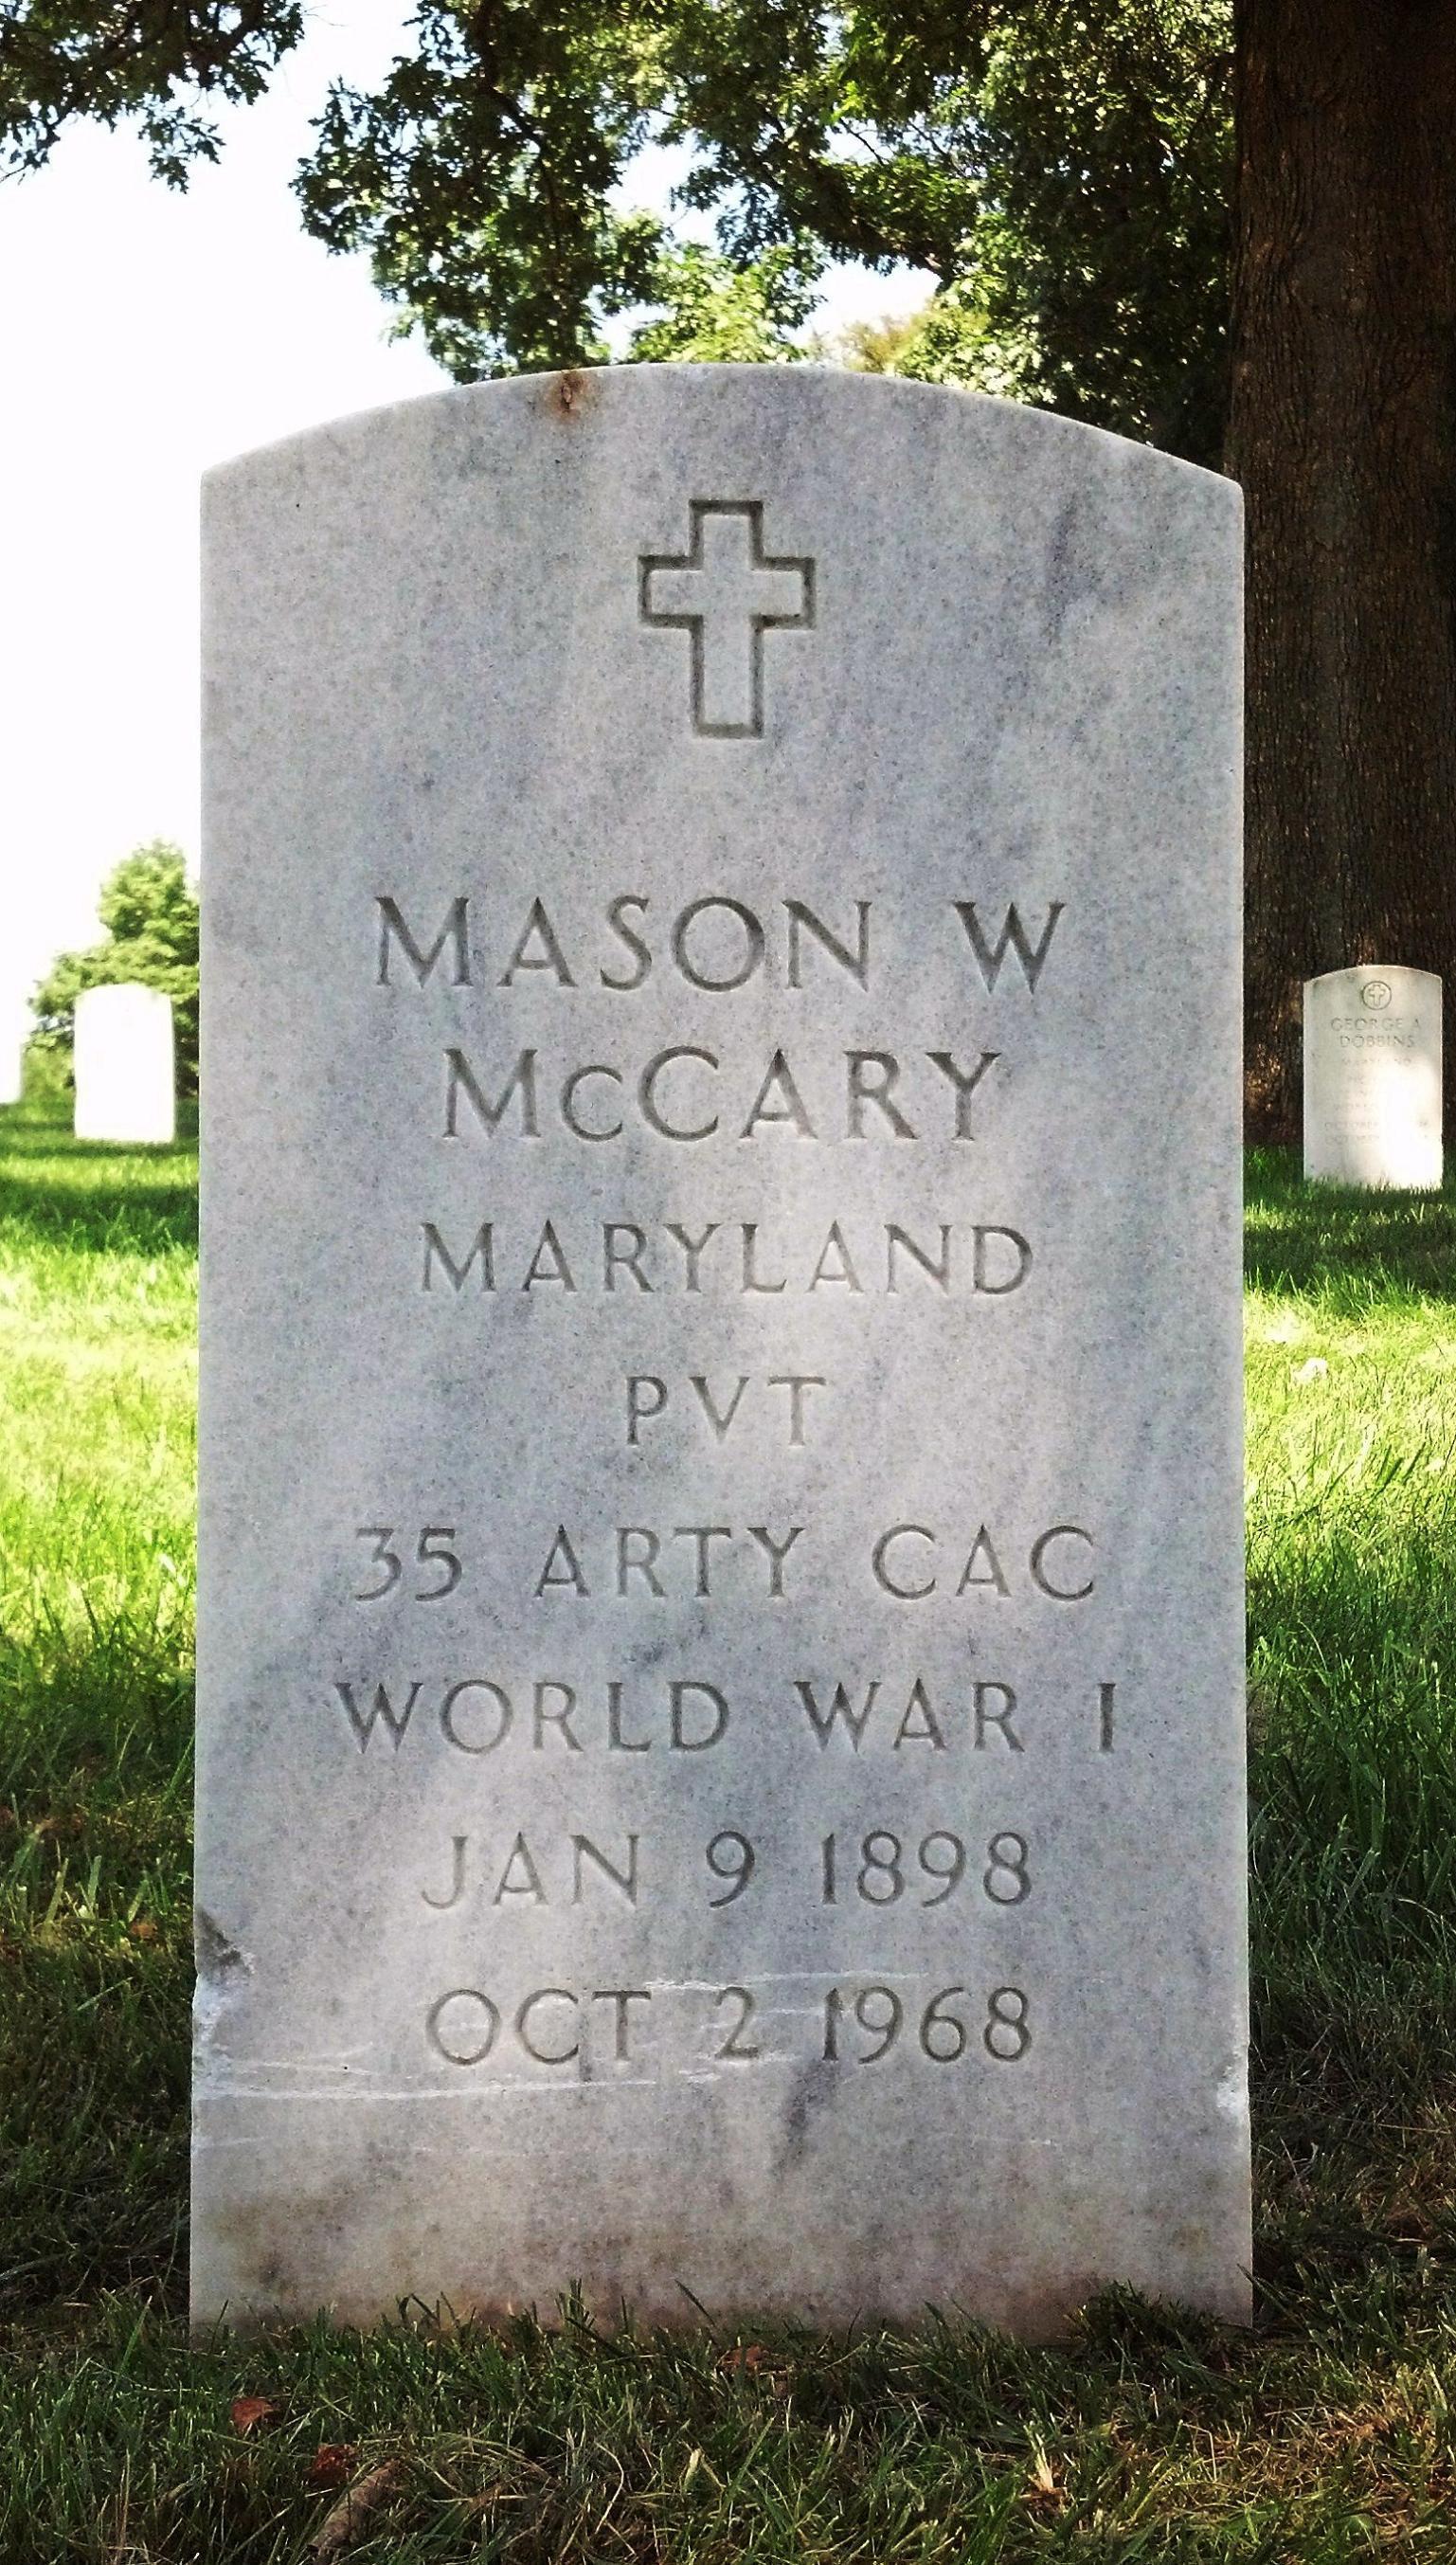 Mason White McCary